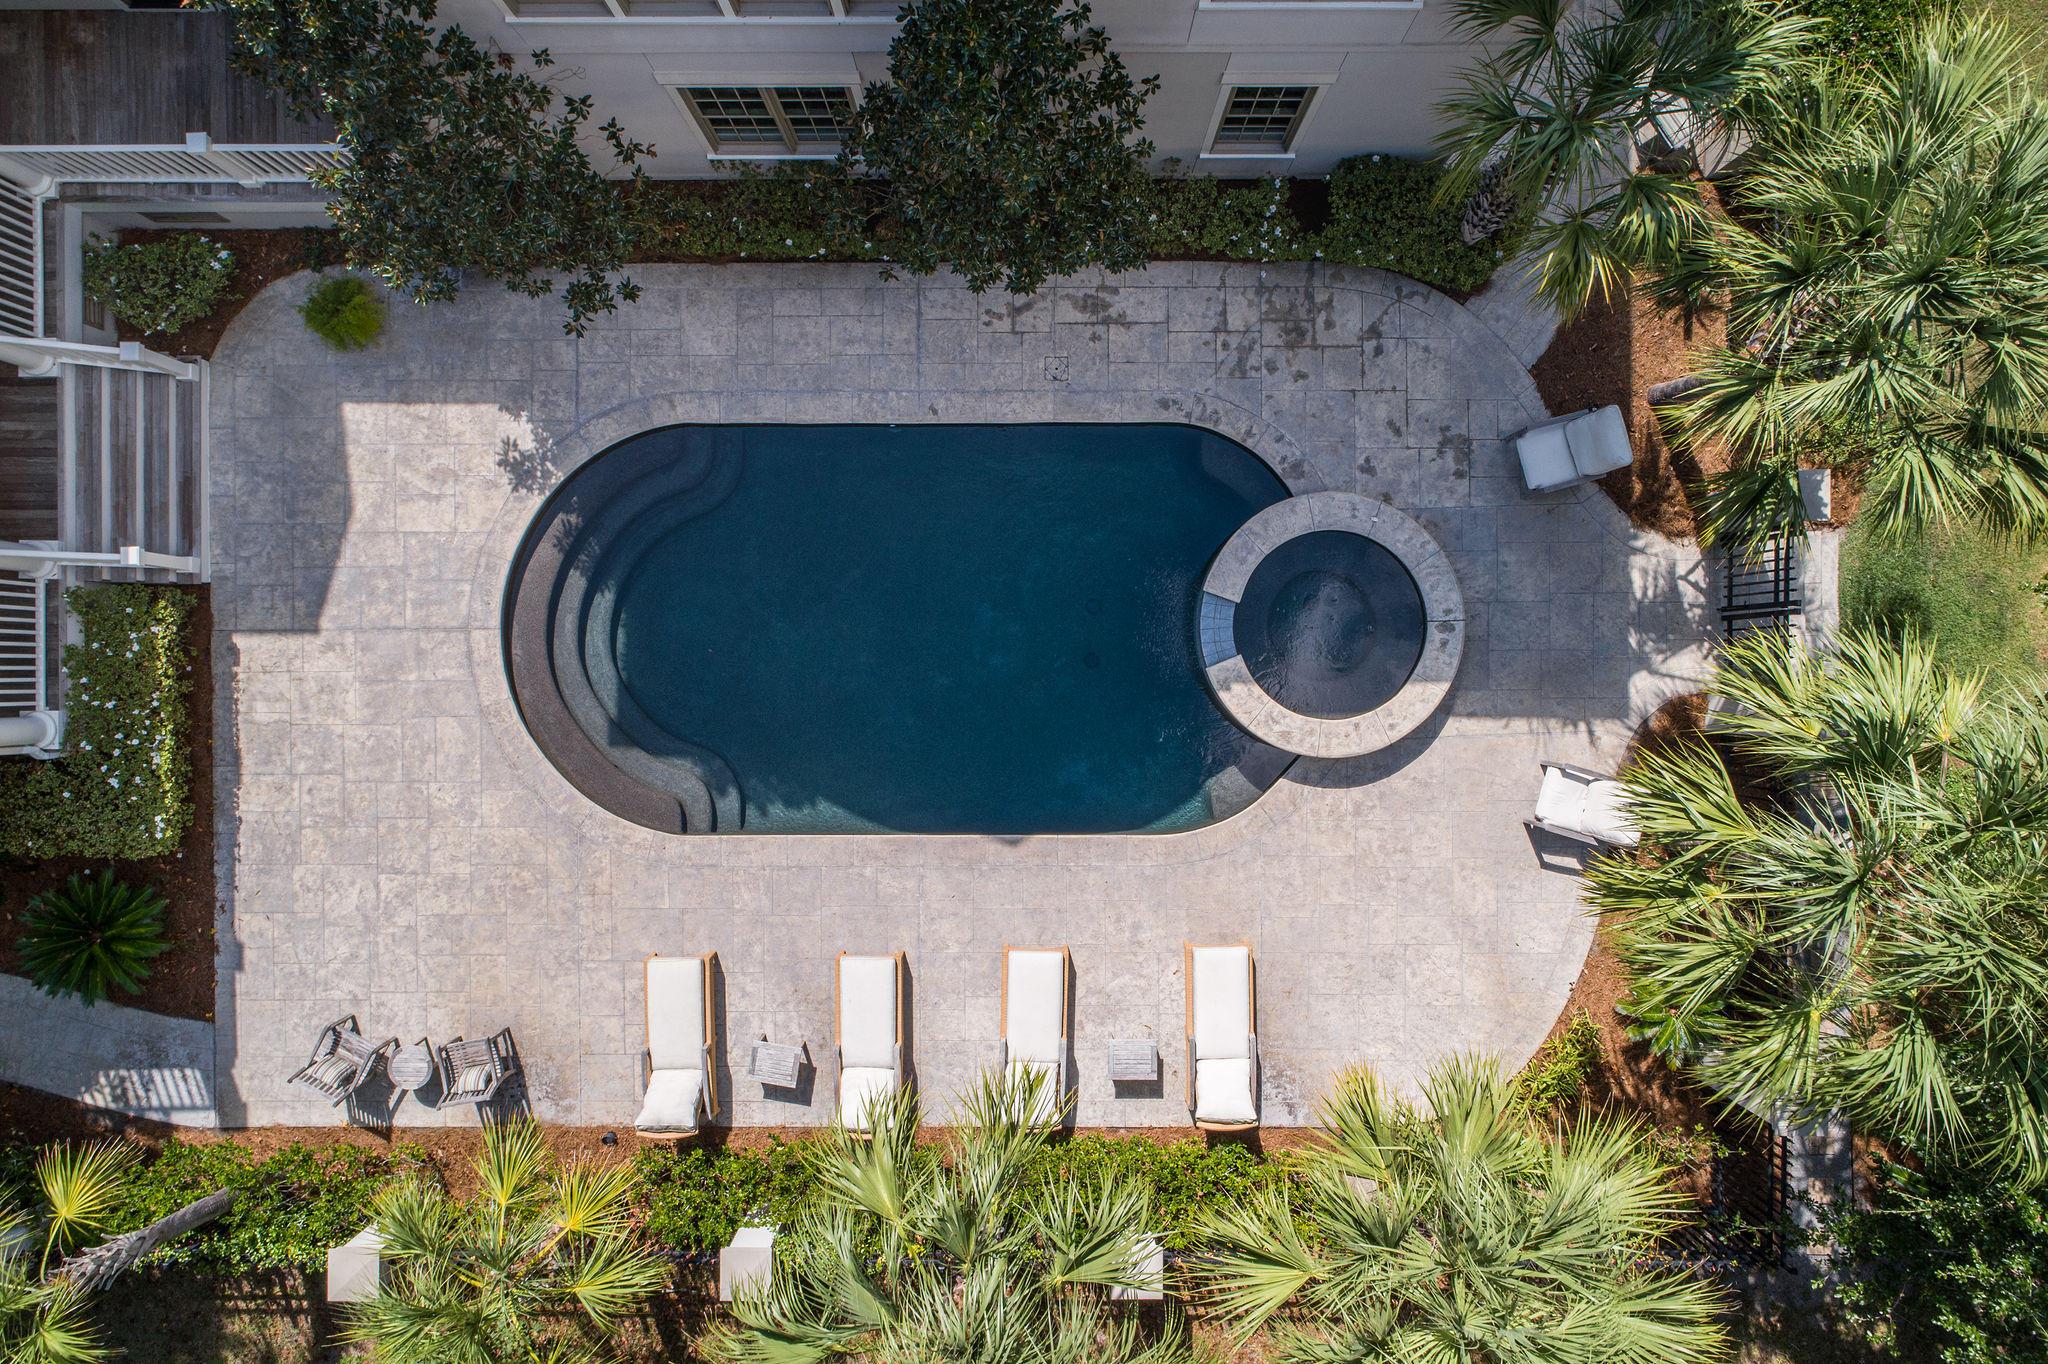 Daniel Island Park Homes For Sale - 312 Hidden Bottom, Charleston, SC - 10